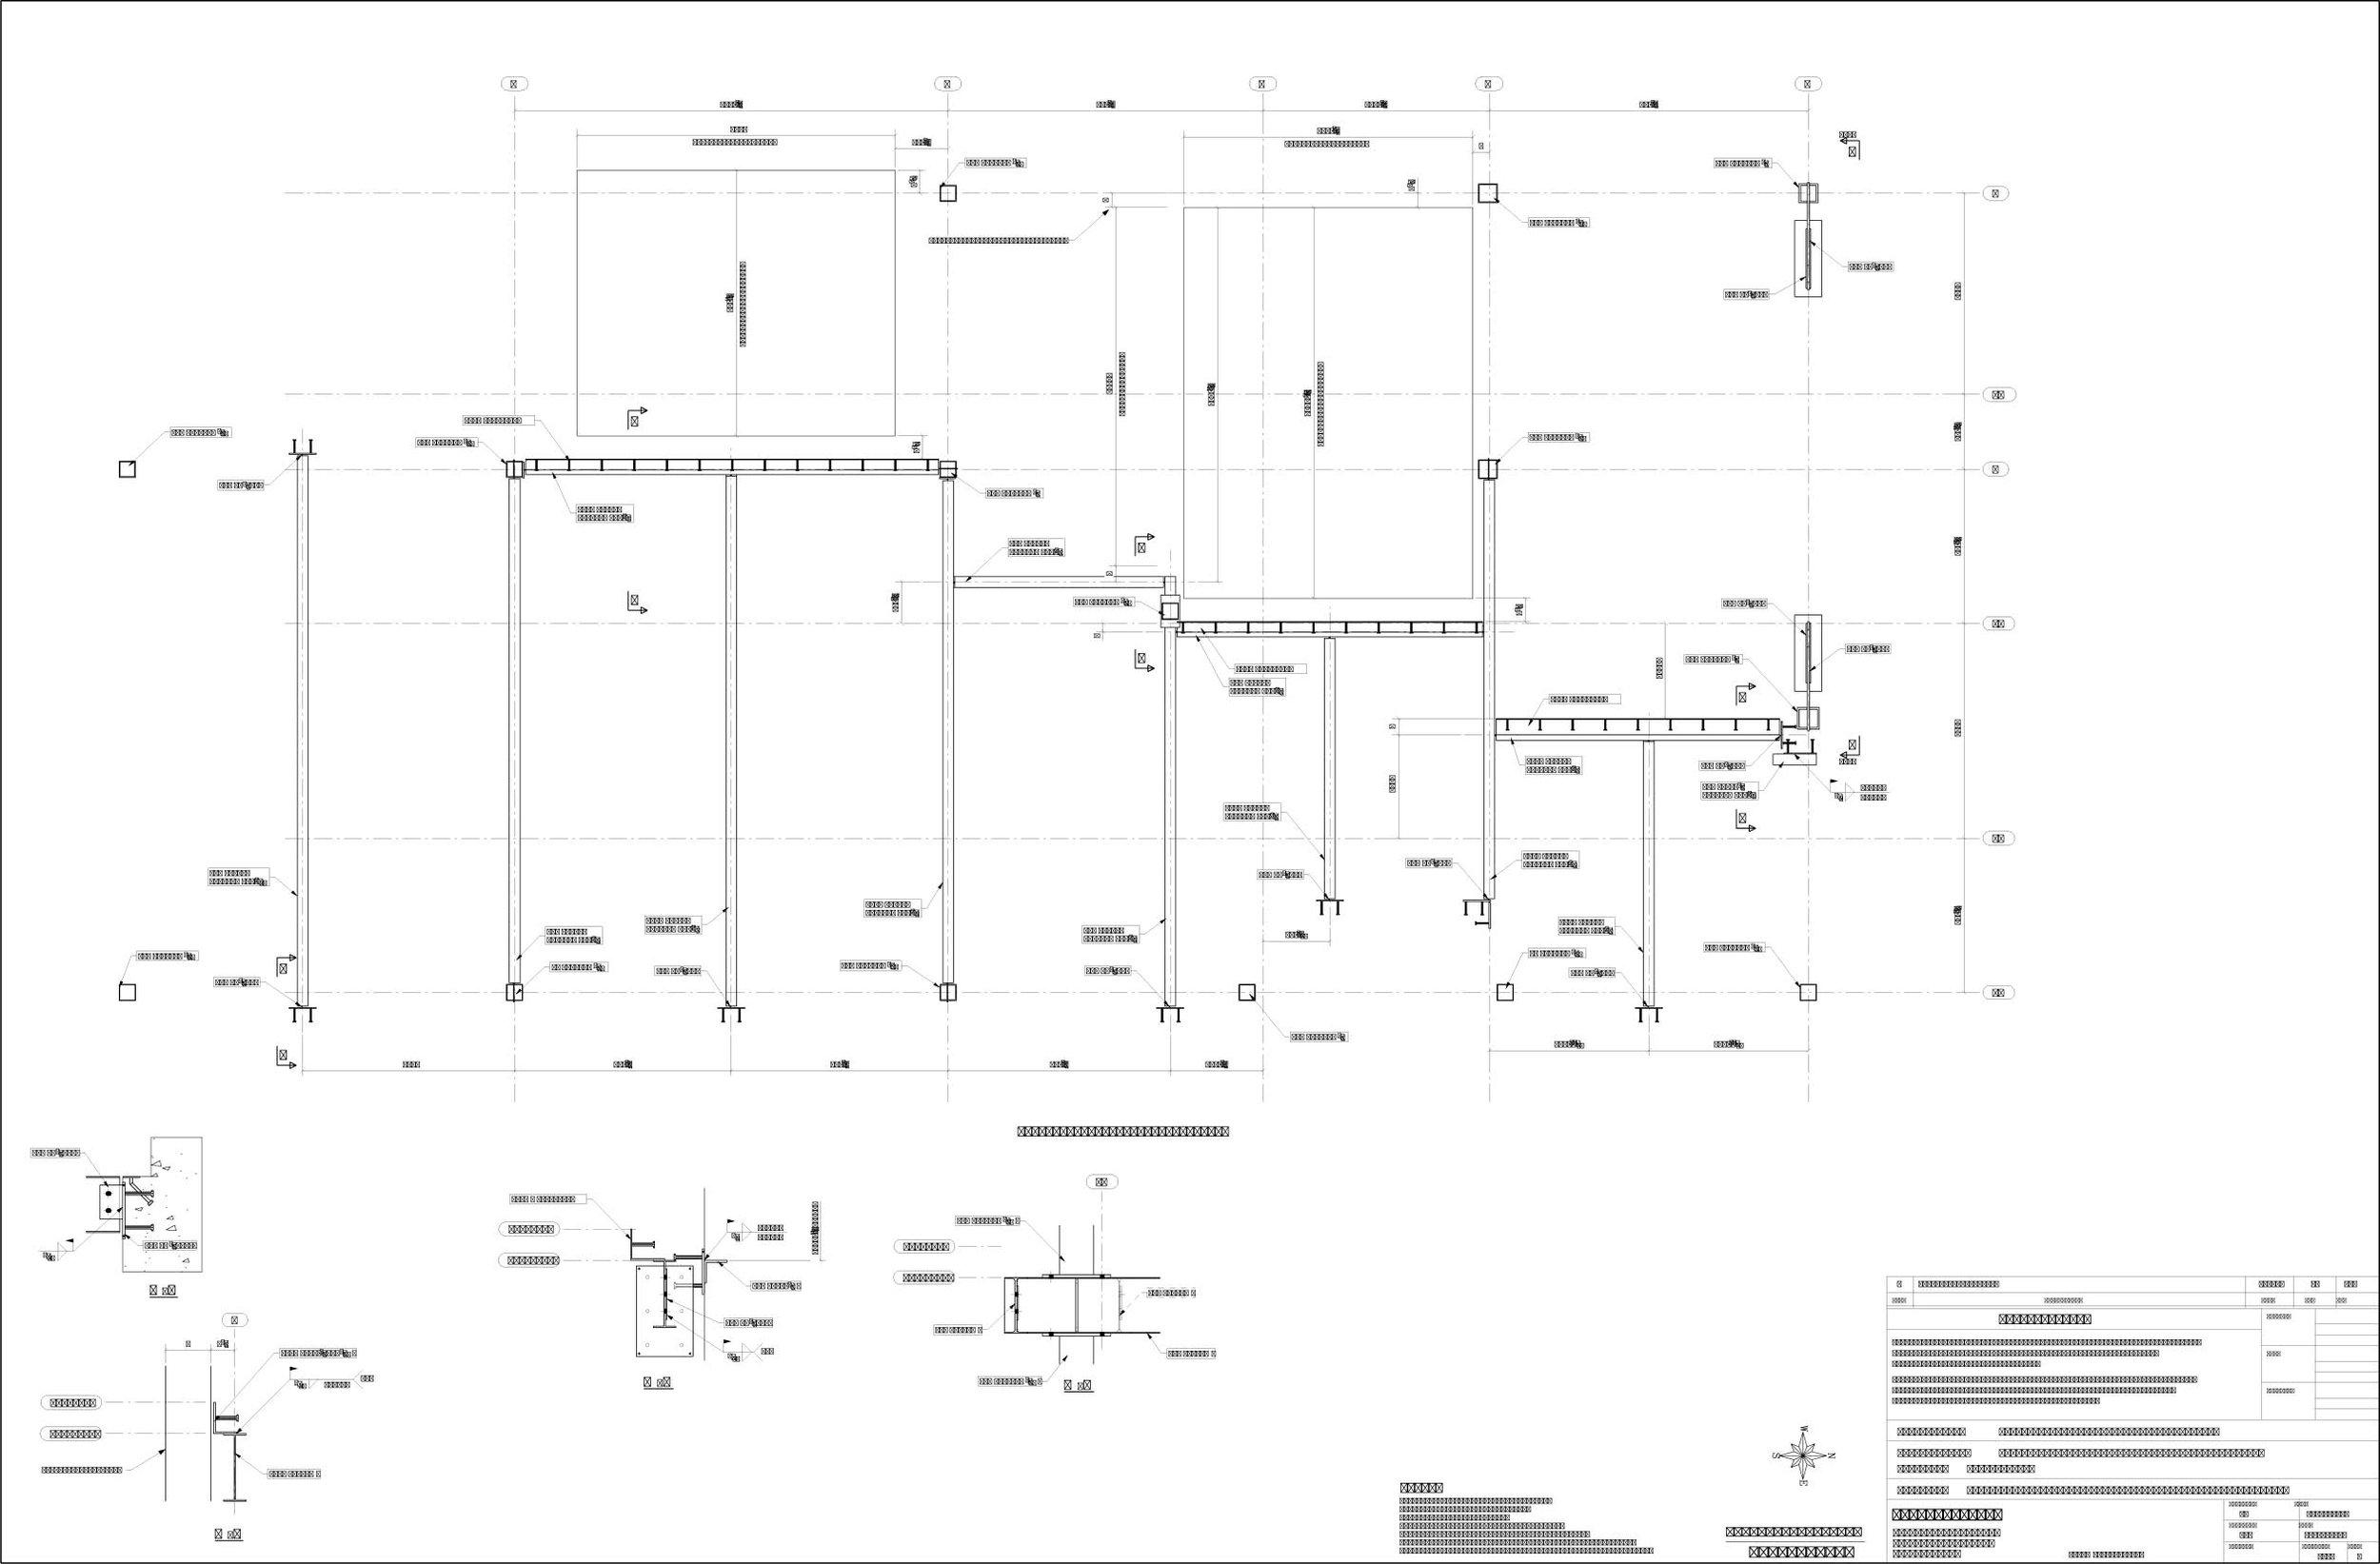 24x36-Placement-Plans-Rev-1-14.jpg